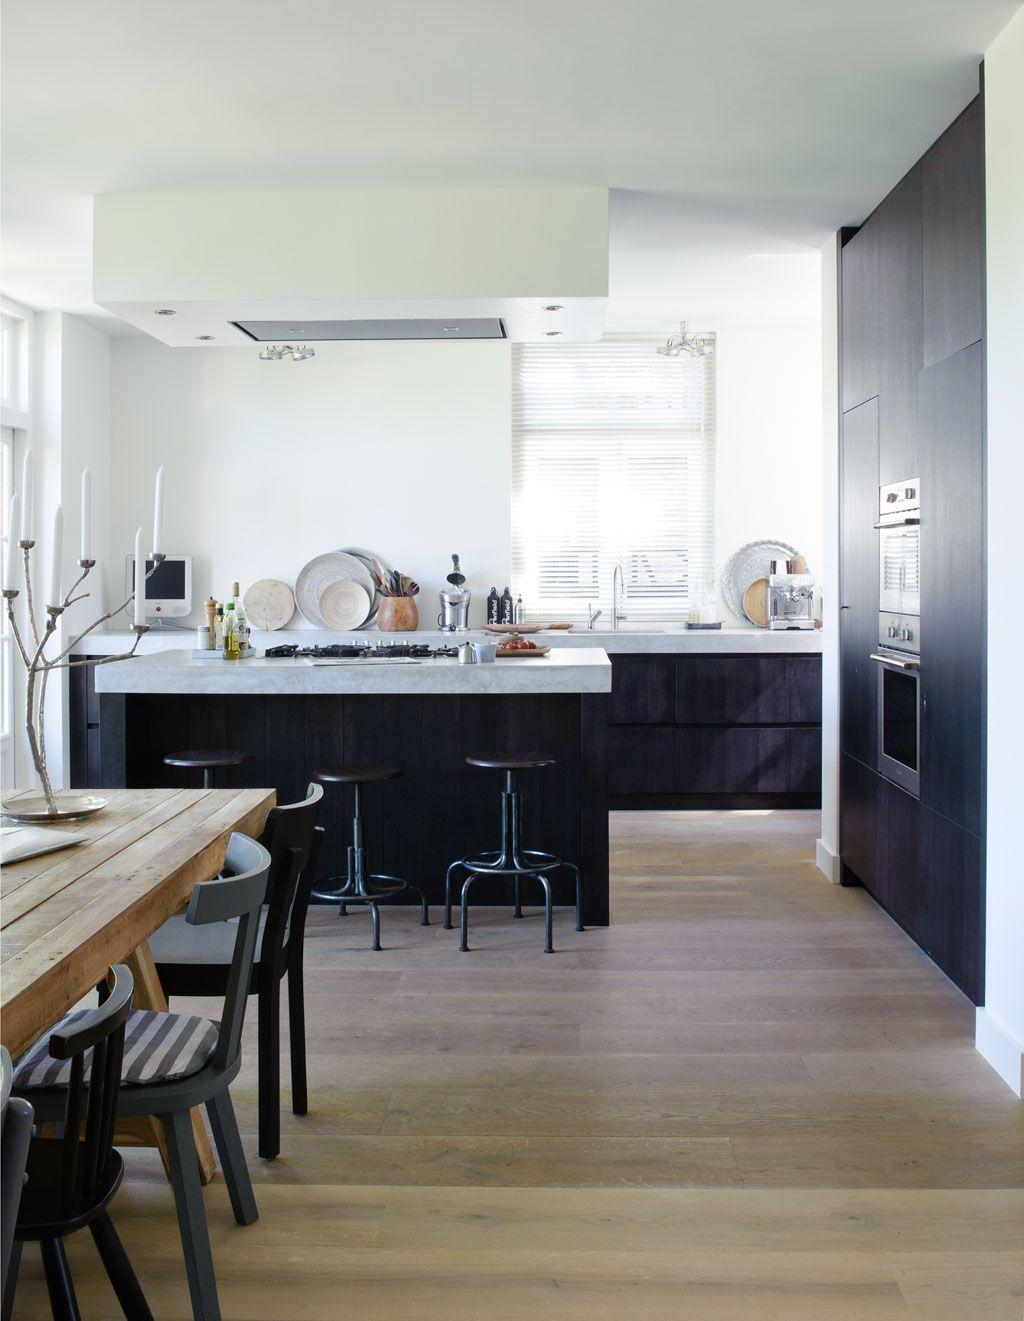 1000+ images about Keuken on Pinterest